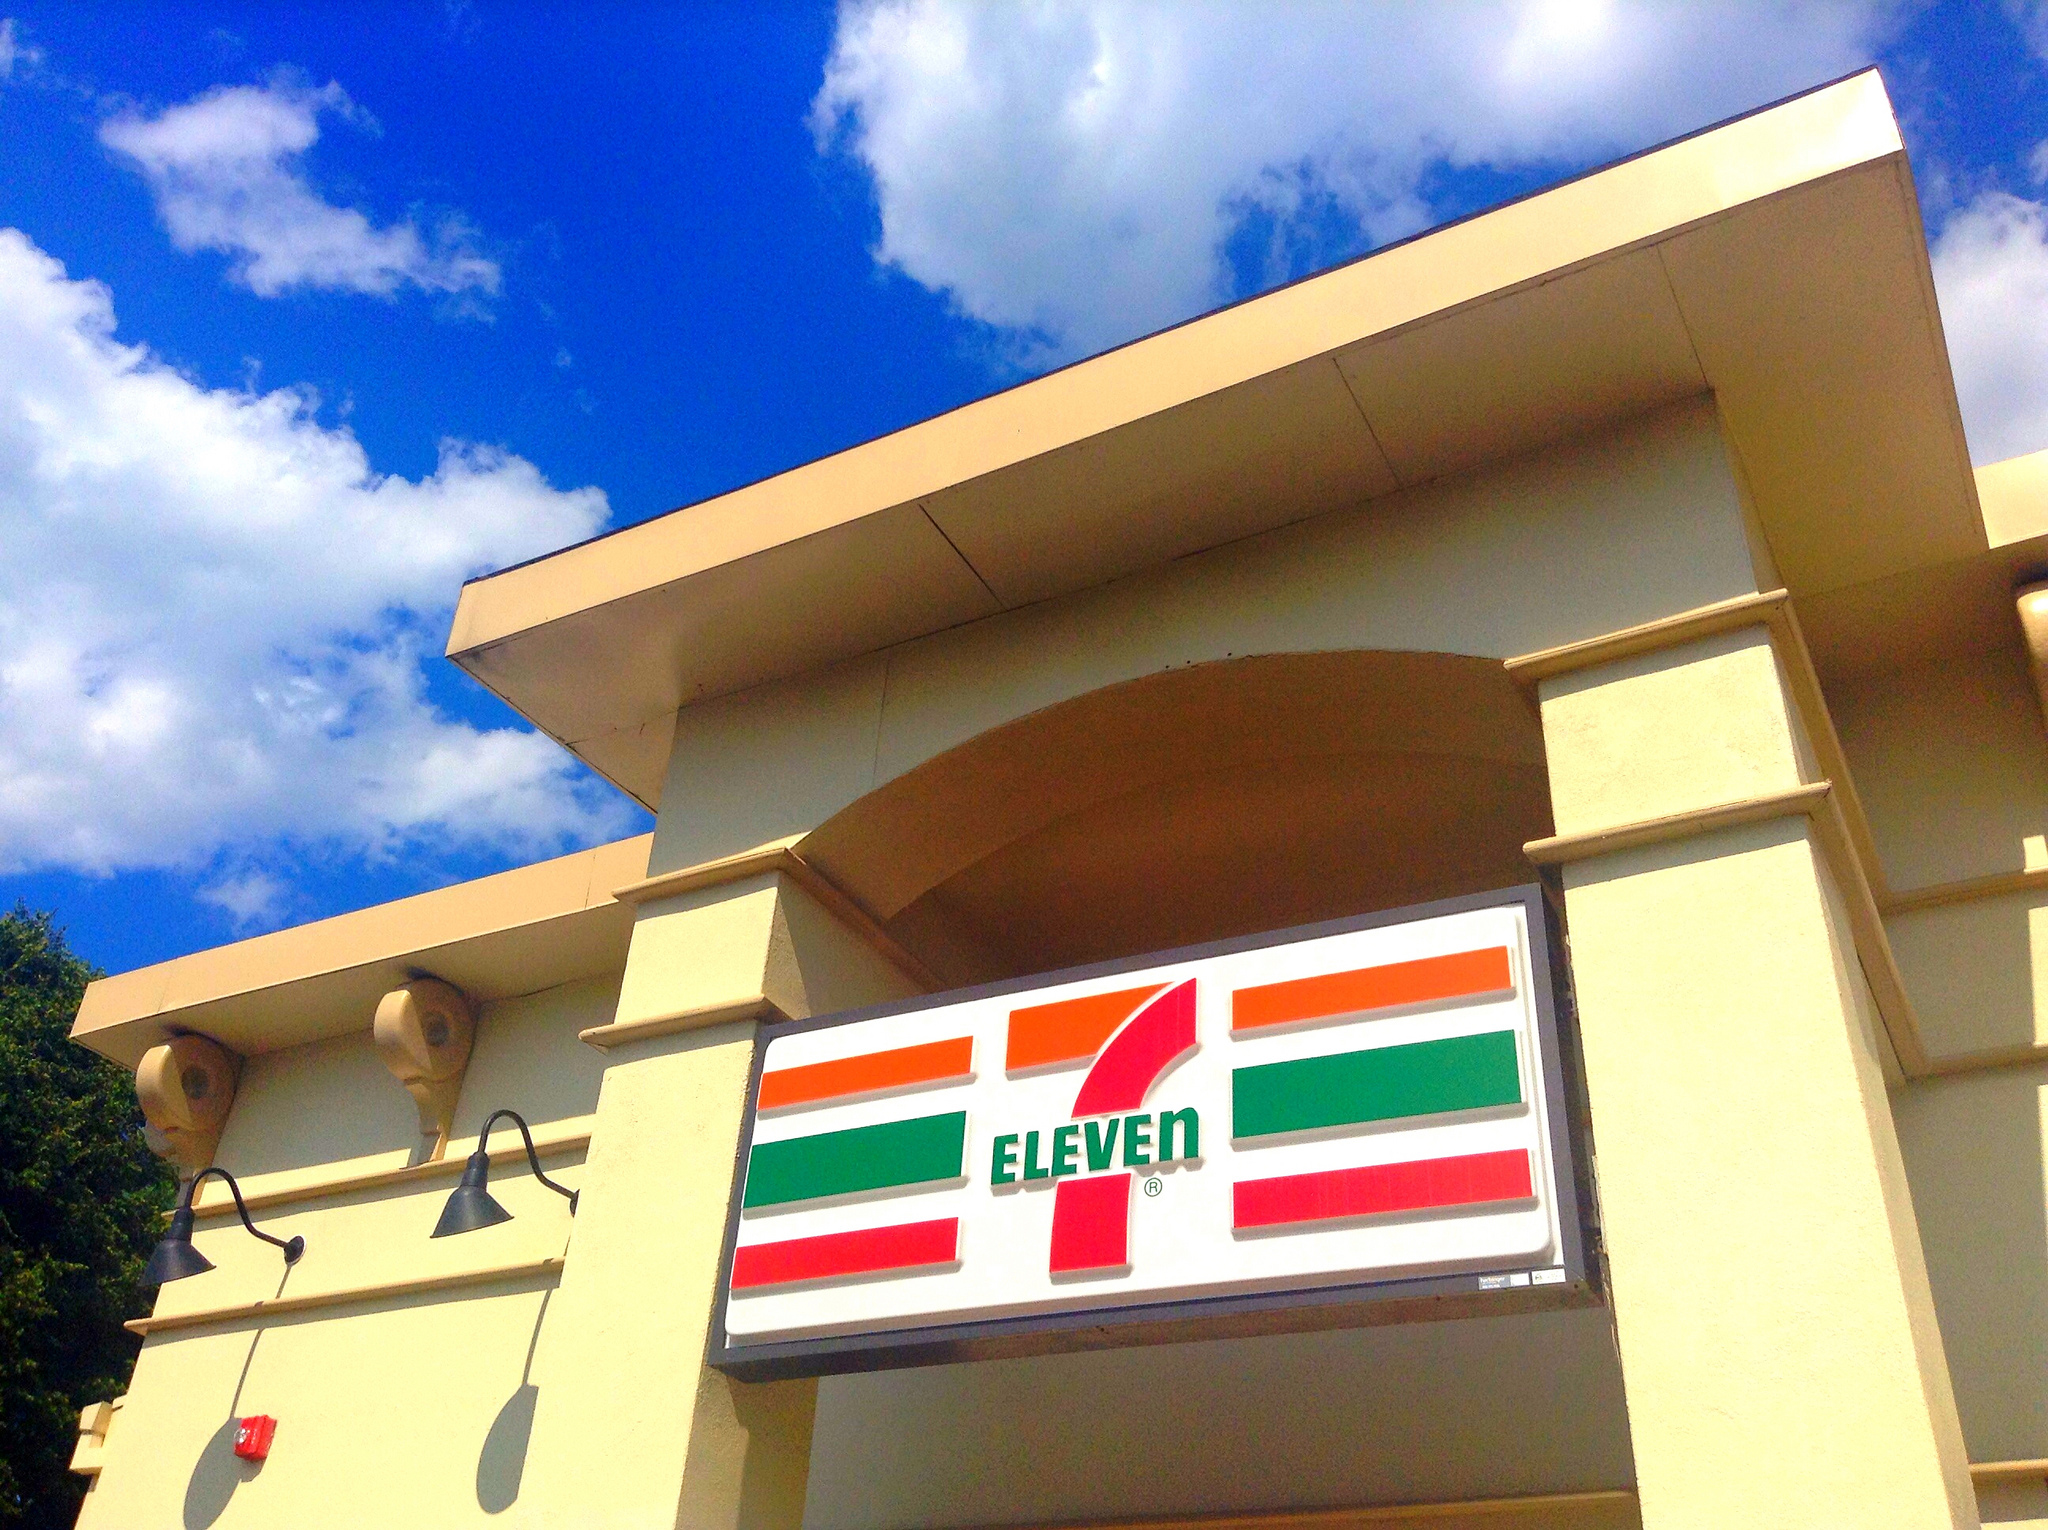 Man Threatens to Kill 7-Eleven Employee Over Nacho Cheese